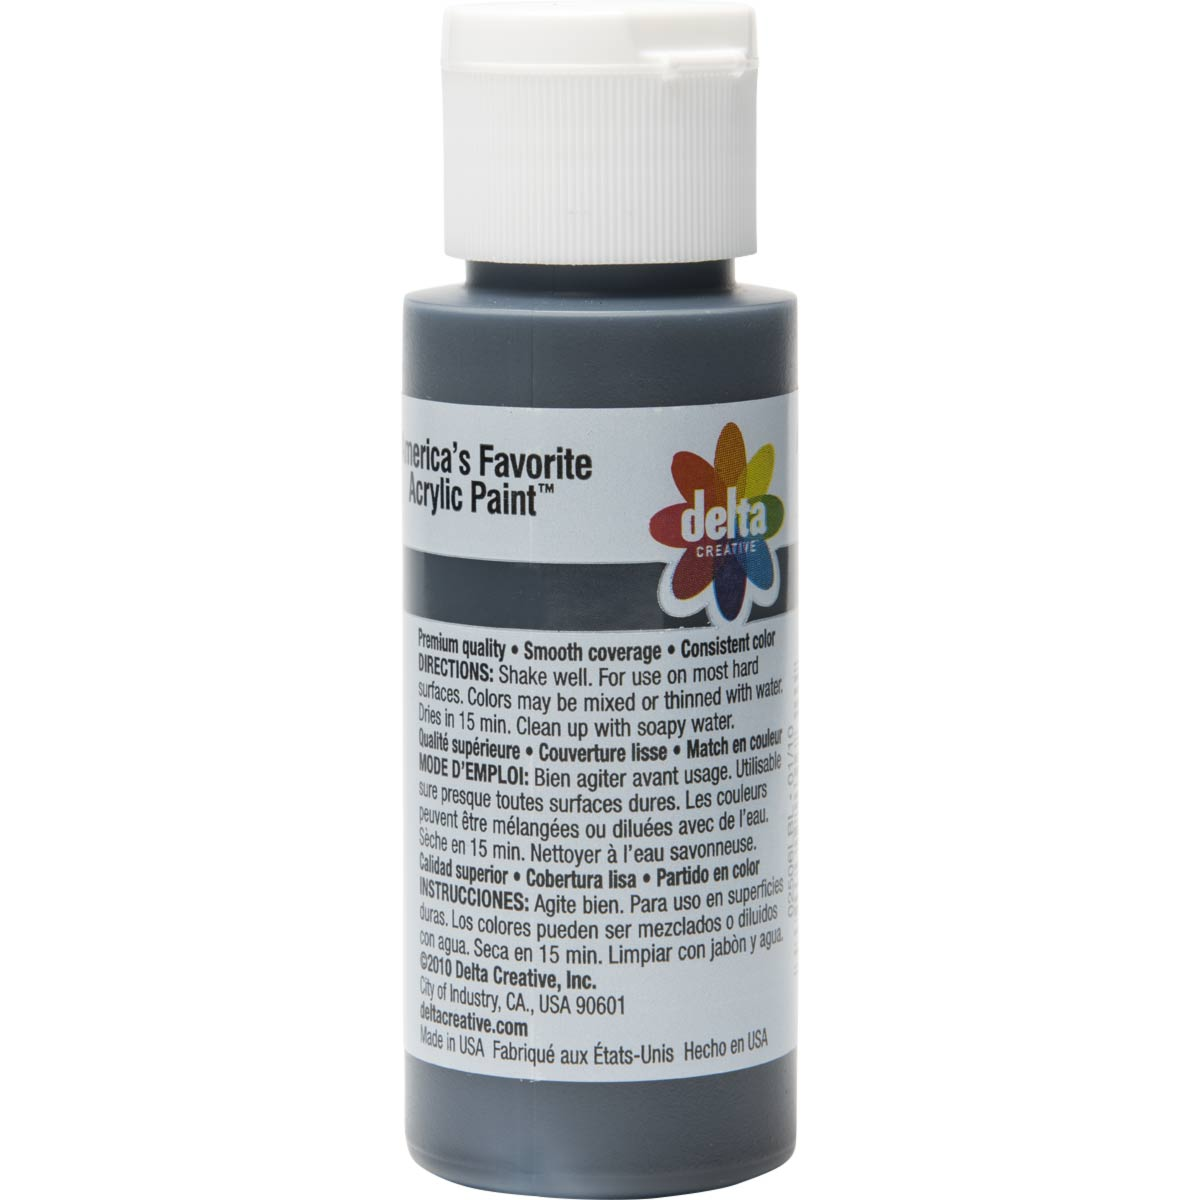 Delta Ceramcoat ® Acrylic Paint - Black, 2 oz.